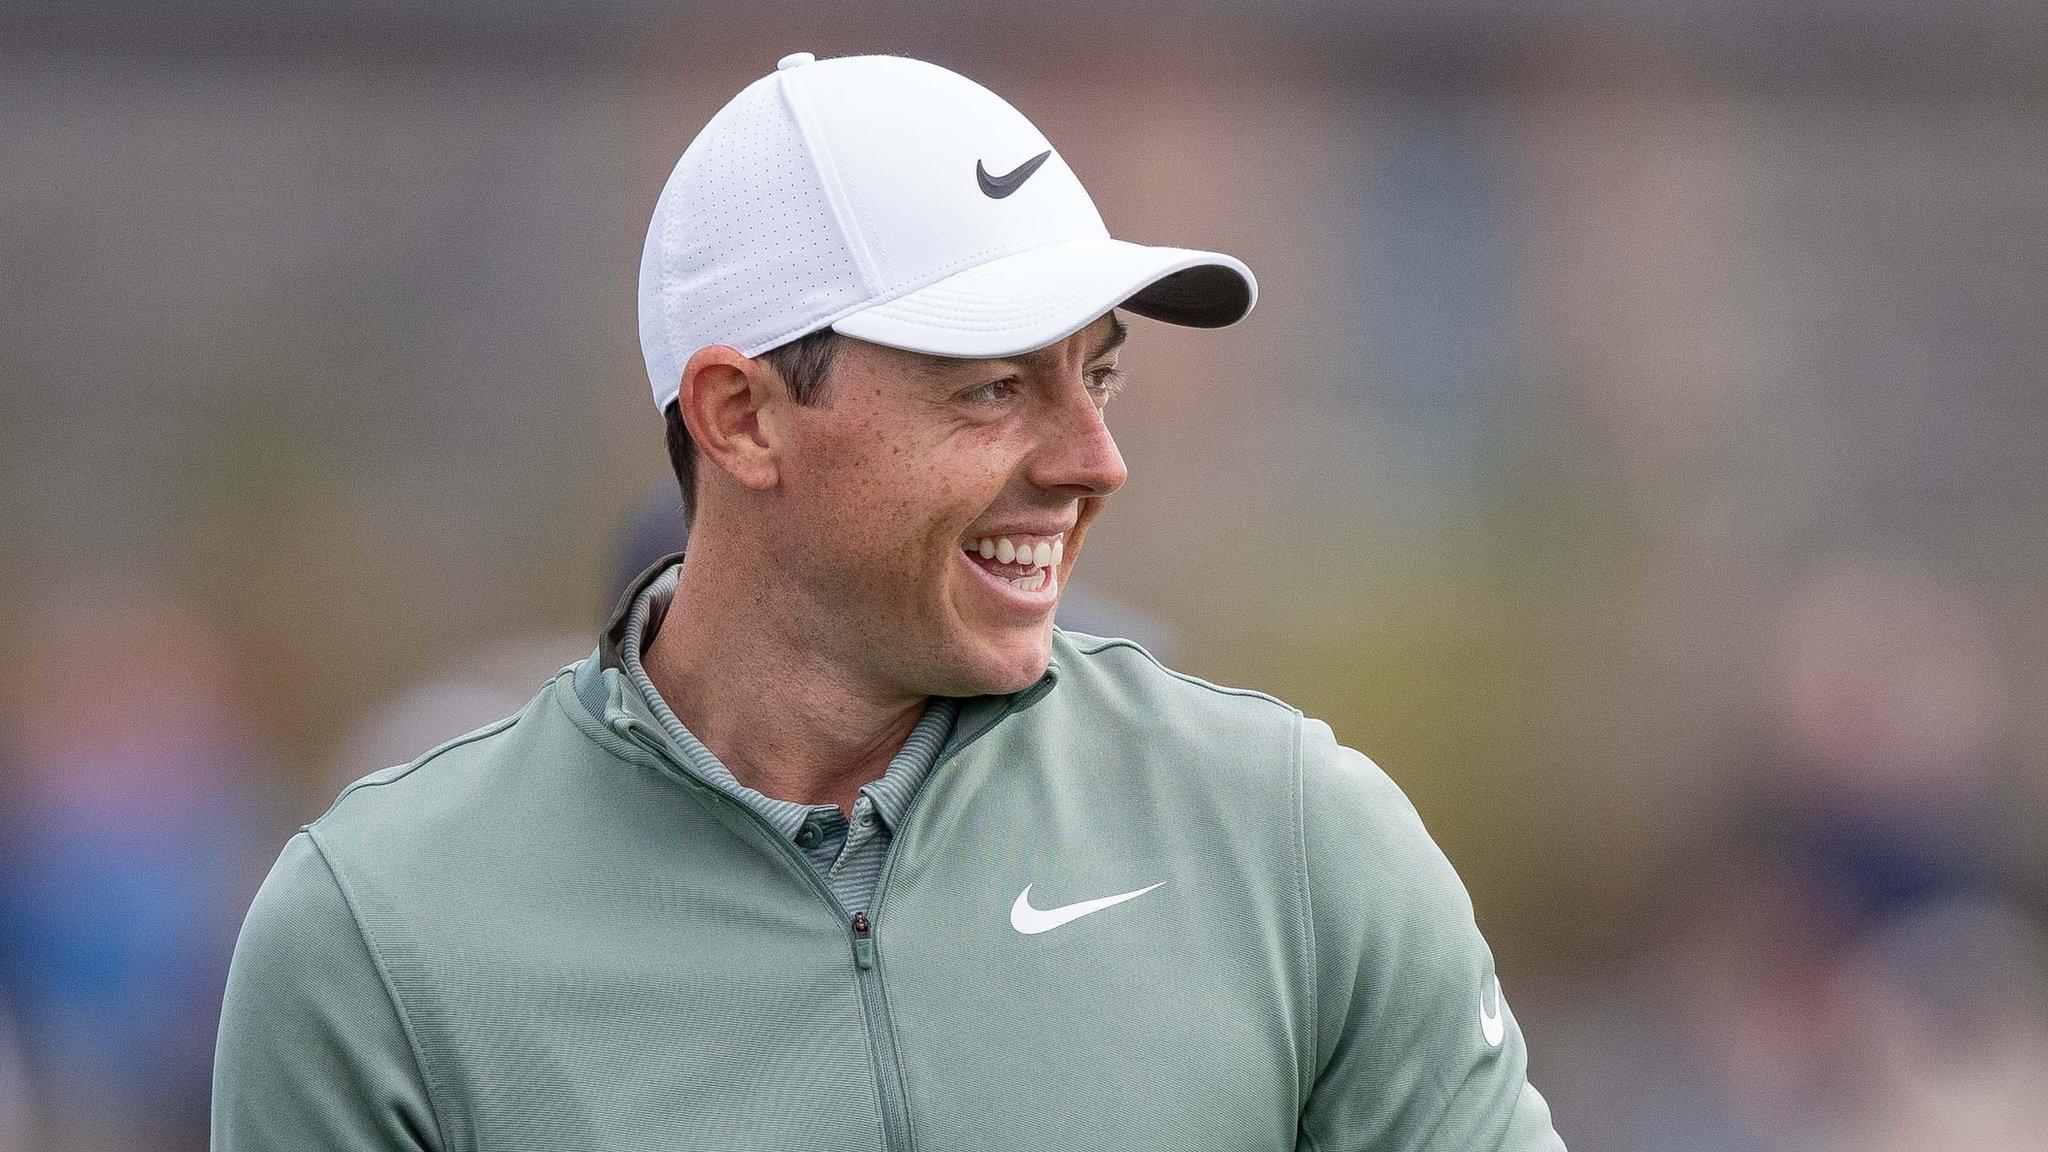 Nedbank Golf Challenge: Rory McIlroy to make Sun City return